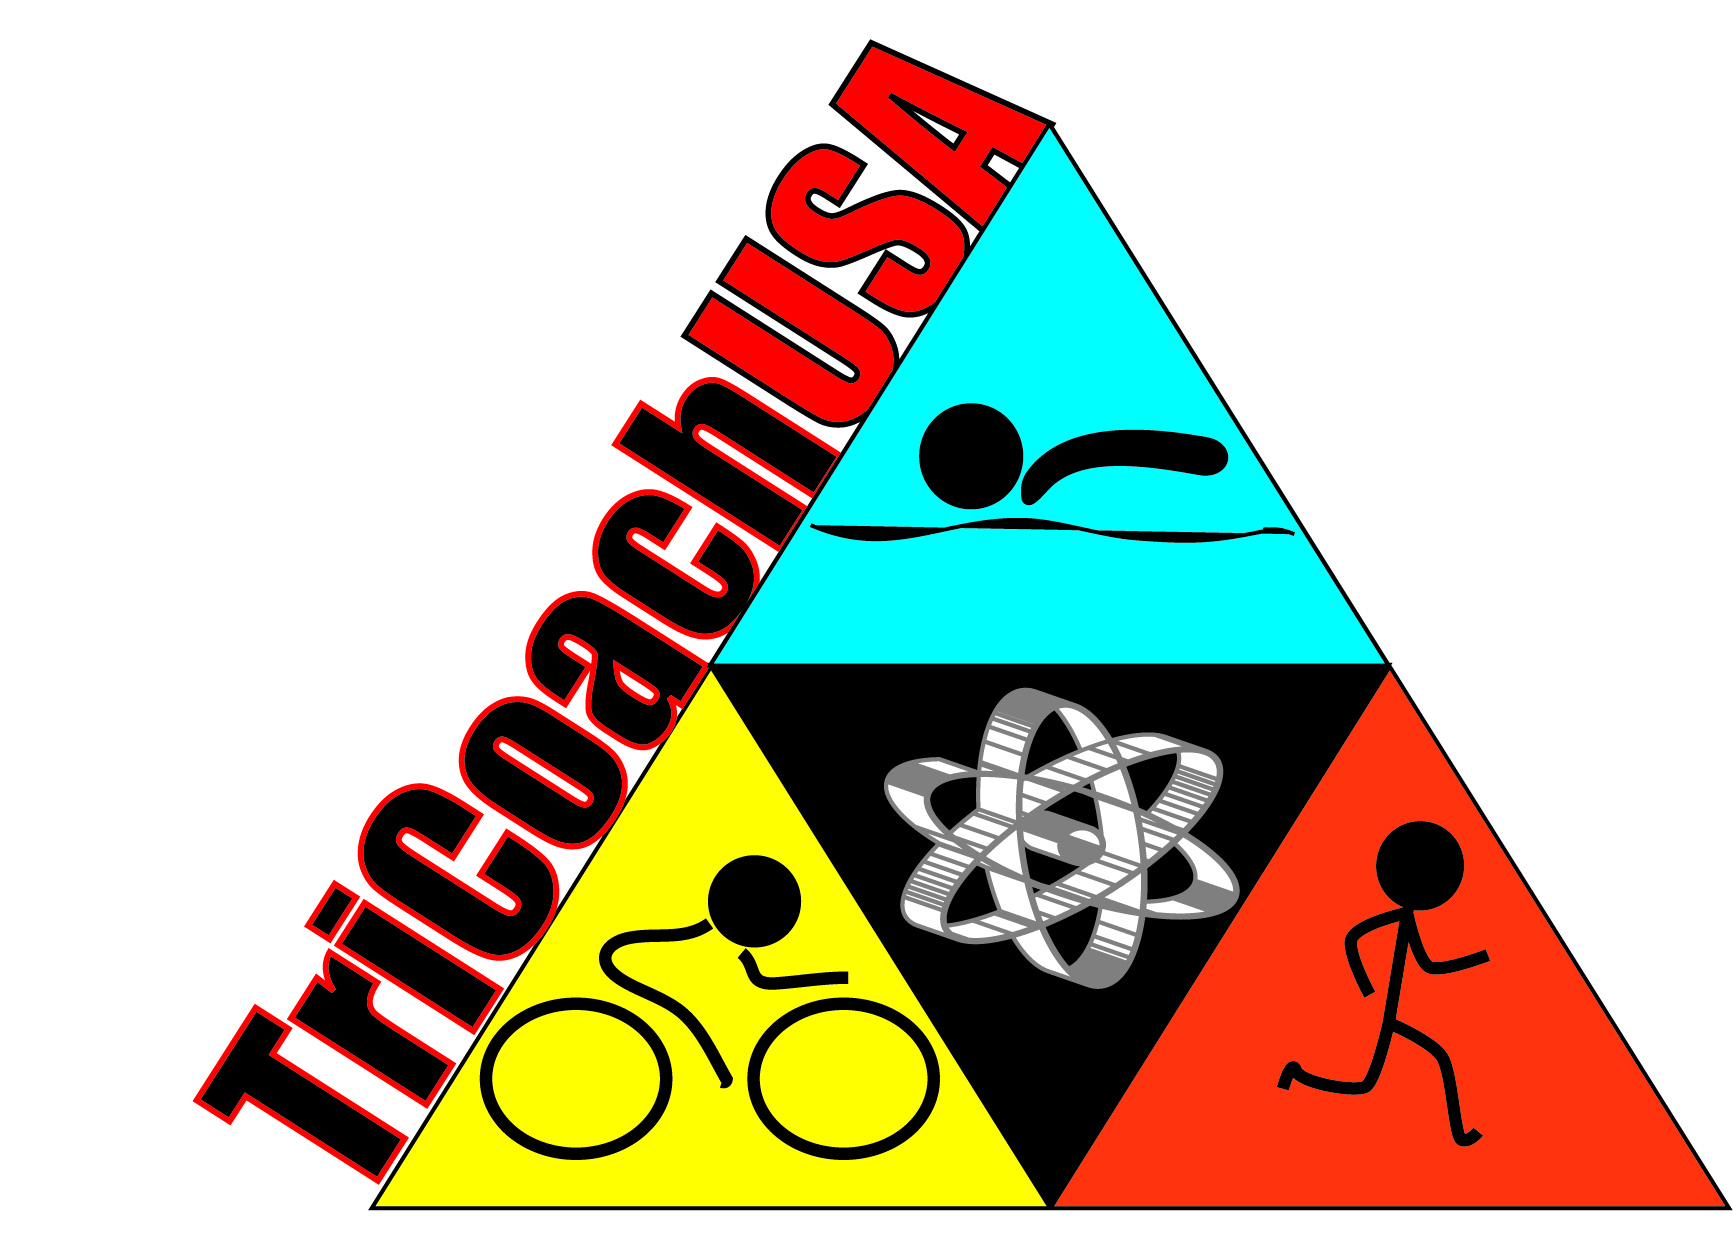 TriCoachUSA